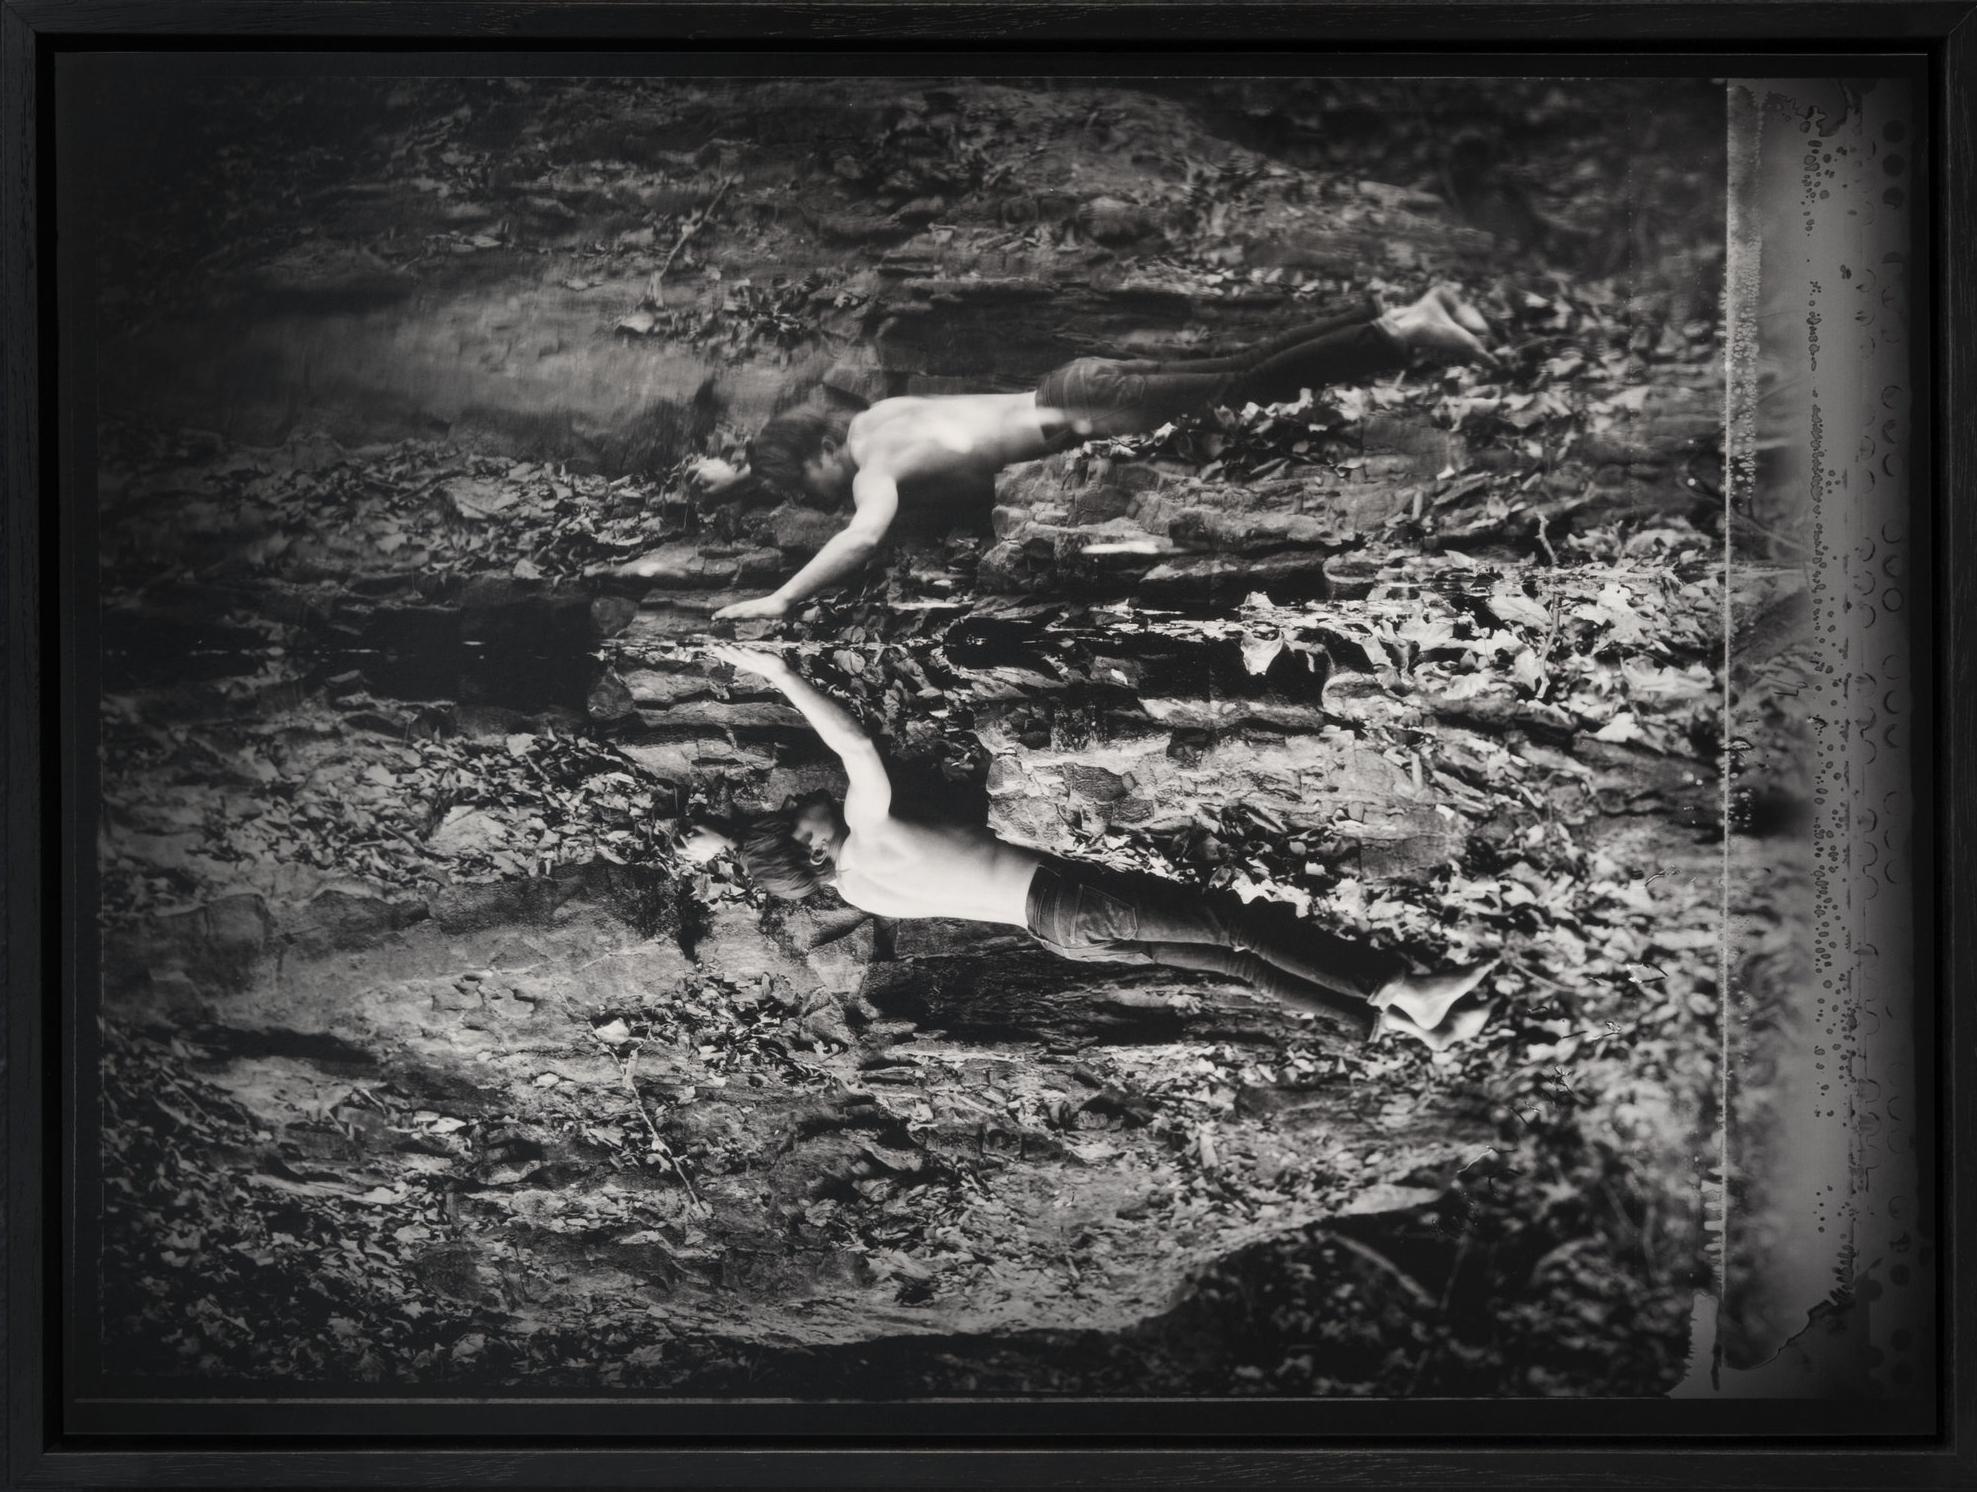 "RIVERS ECHO - 19 x 24"" - ARCHIVAL PIGMENT PRINT - 2011"